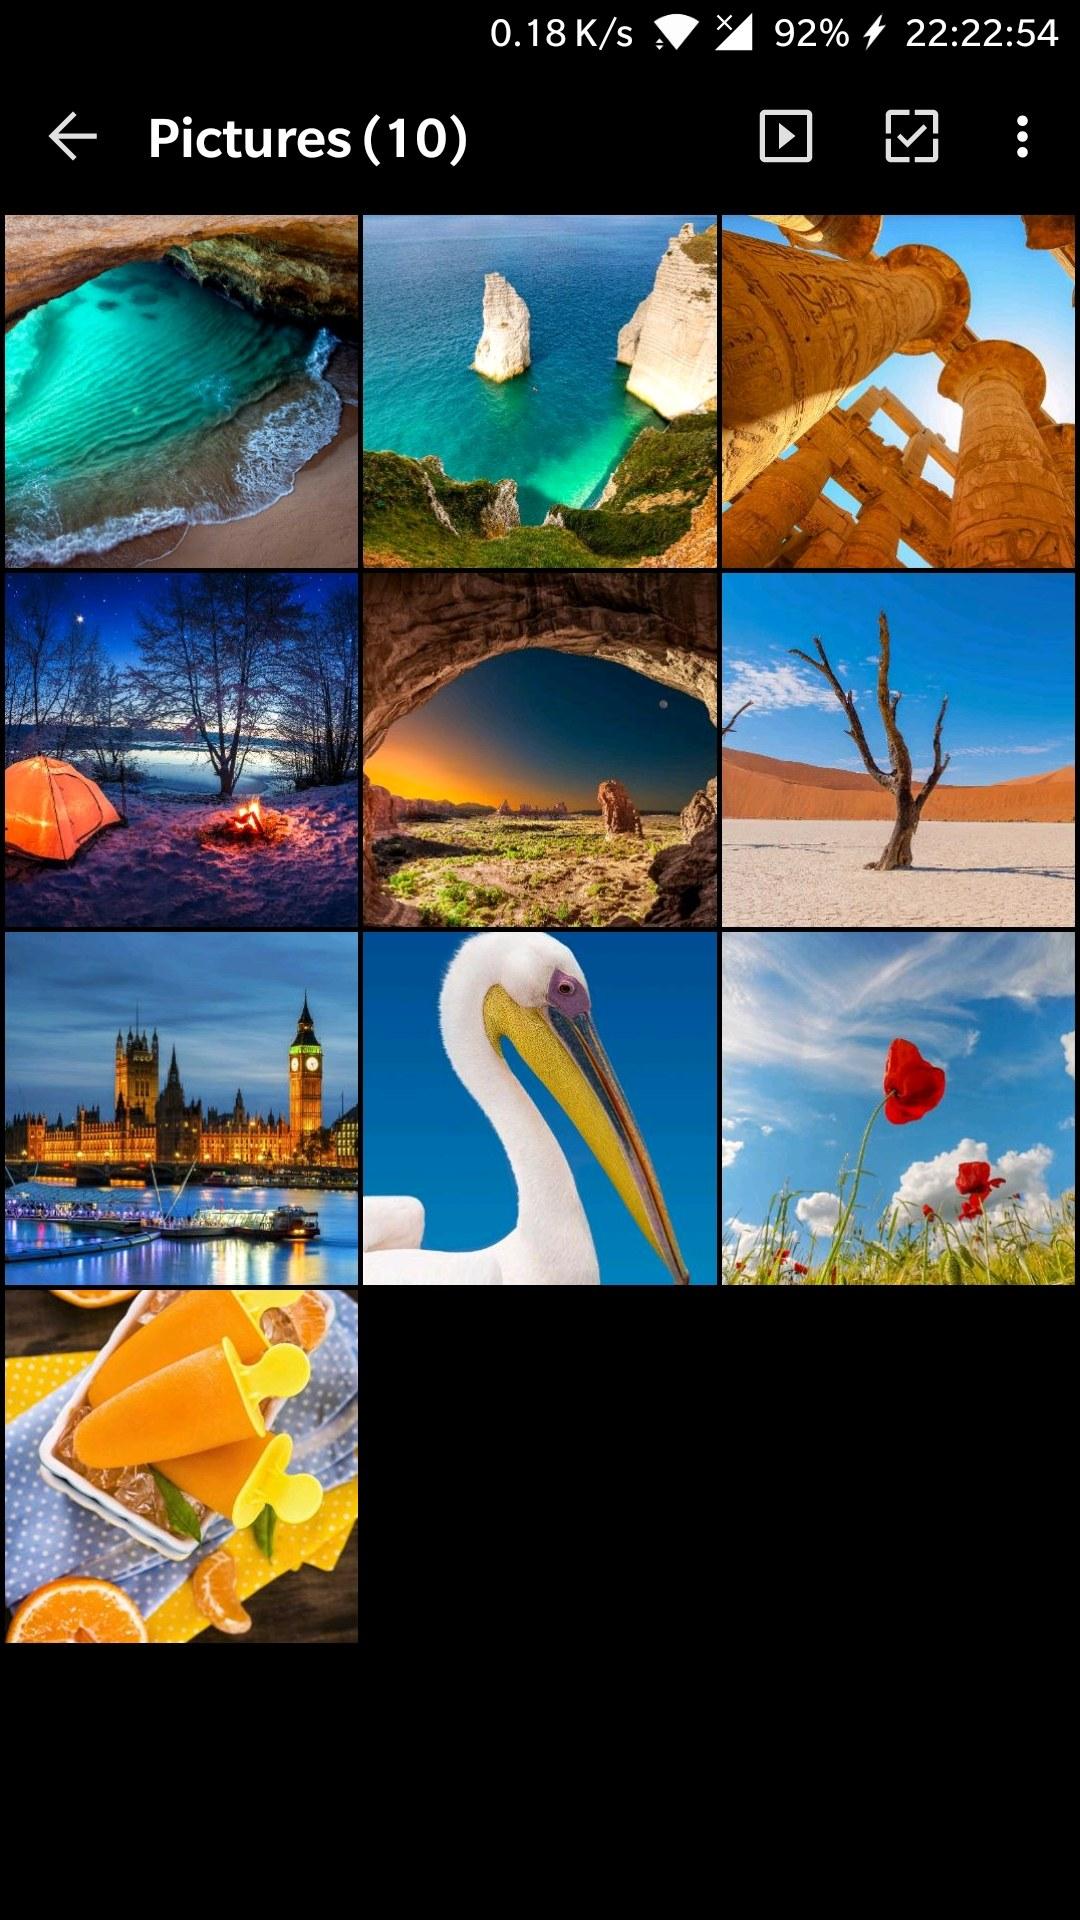 Gallery App -Android Oreo Oneplus 5